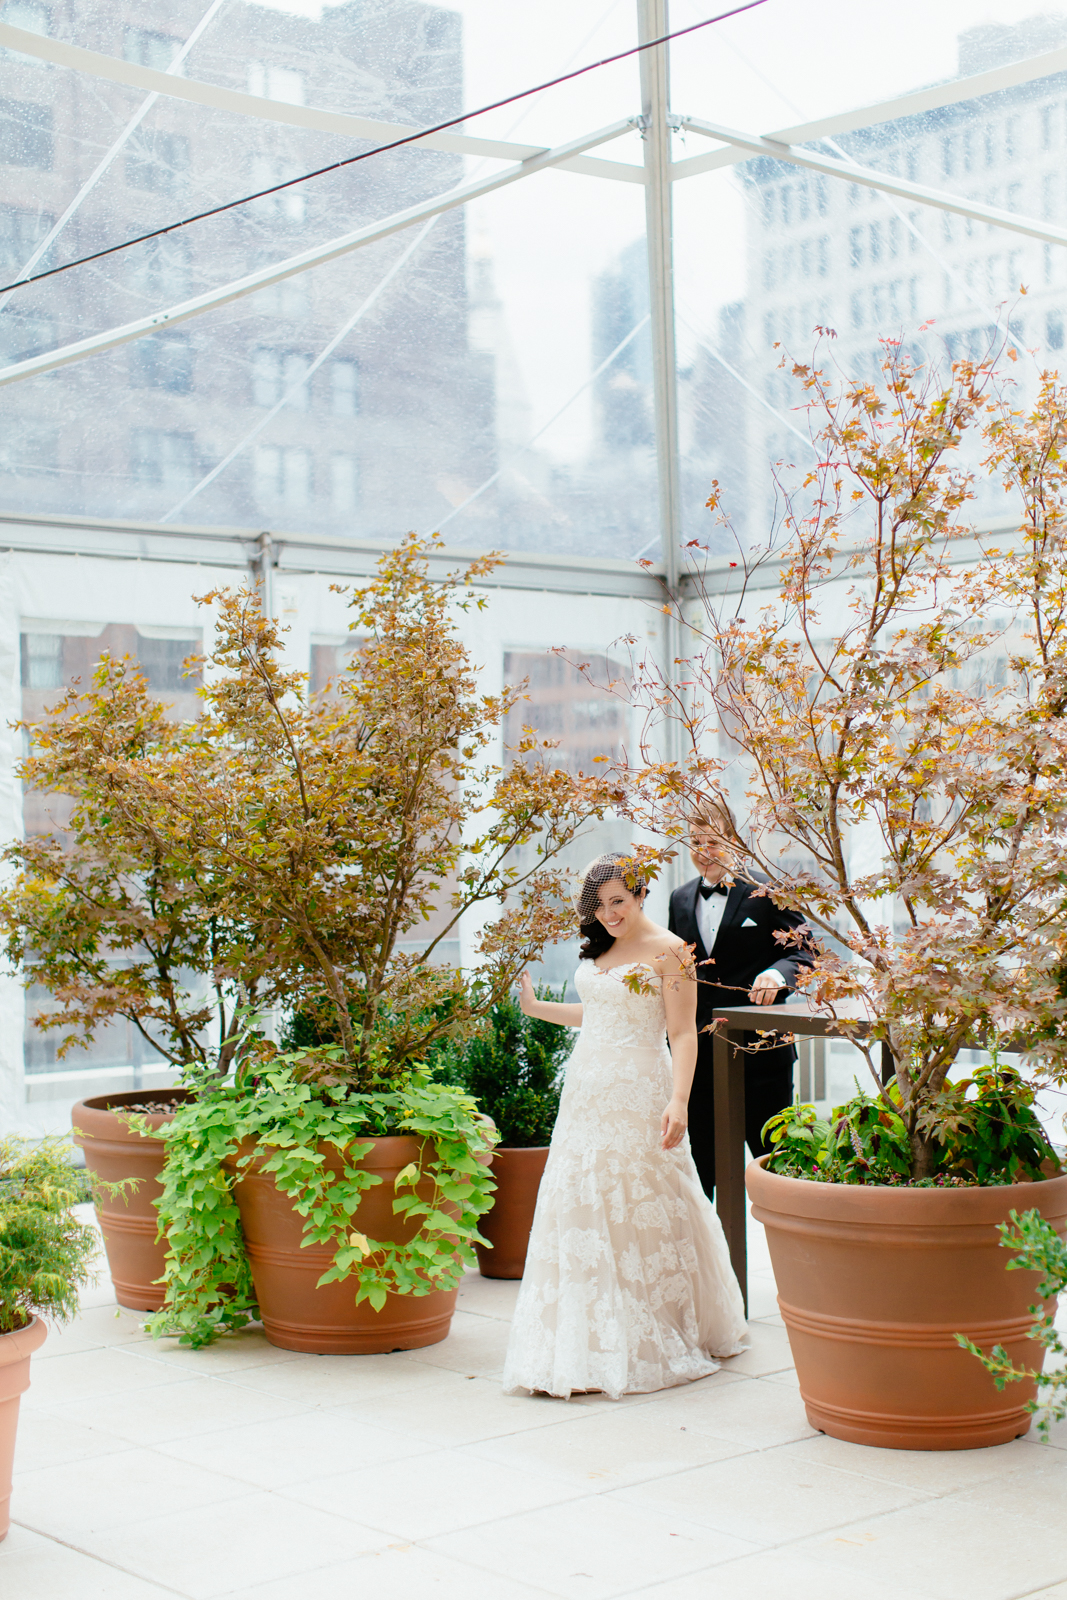 NYC Wedding Photography Lofts at Prince Brooklyn NYC Photographer Boris Zaretsky _B2C7306.jpg